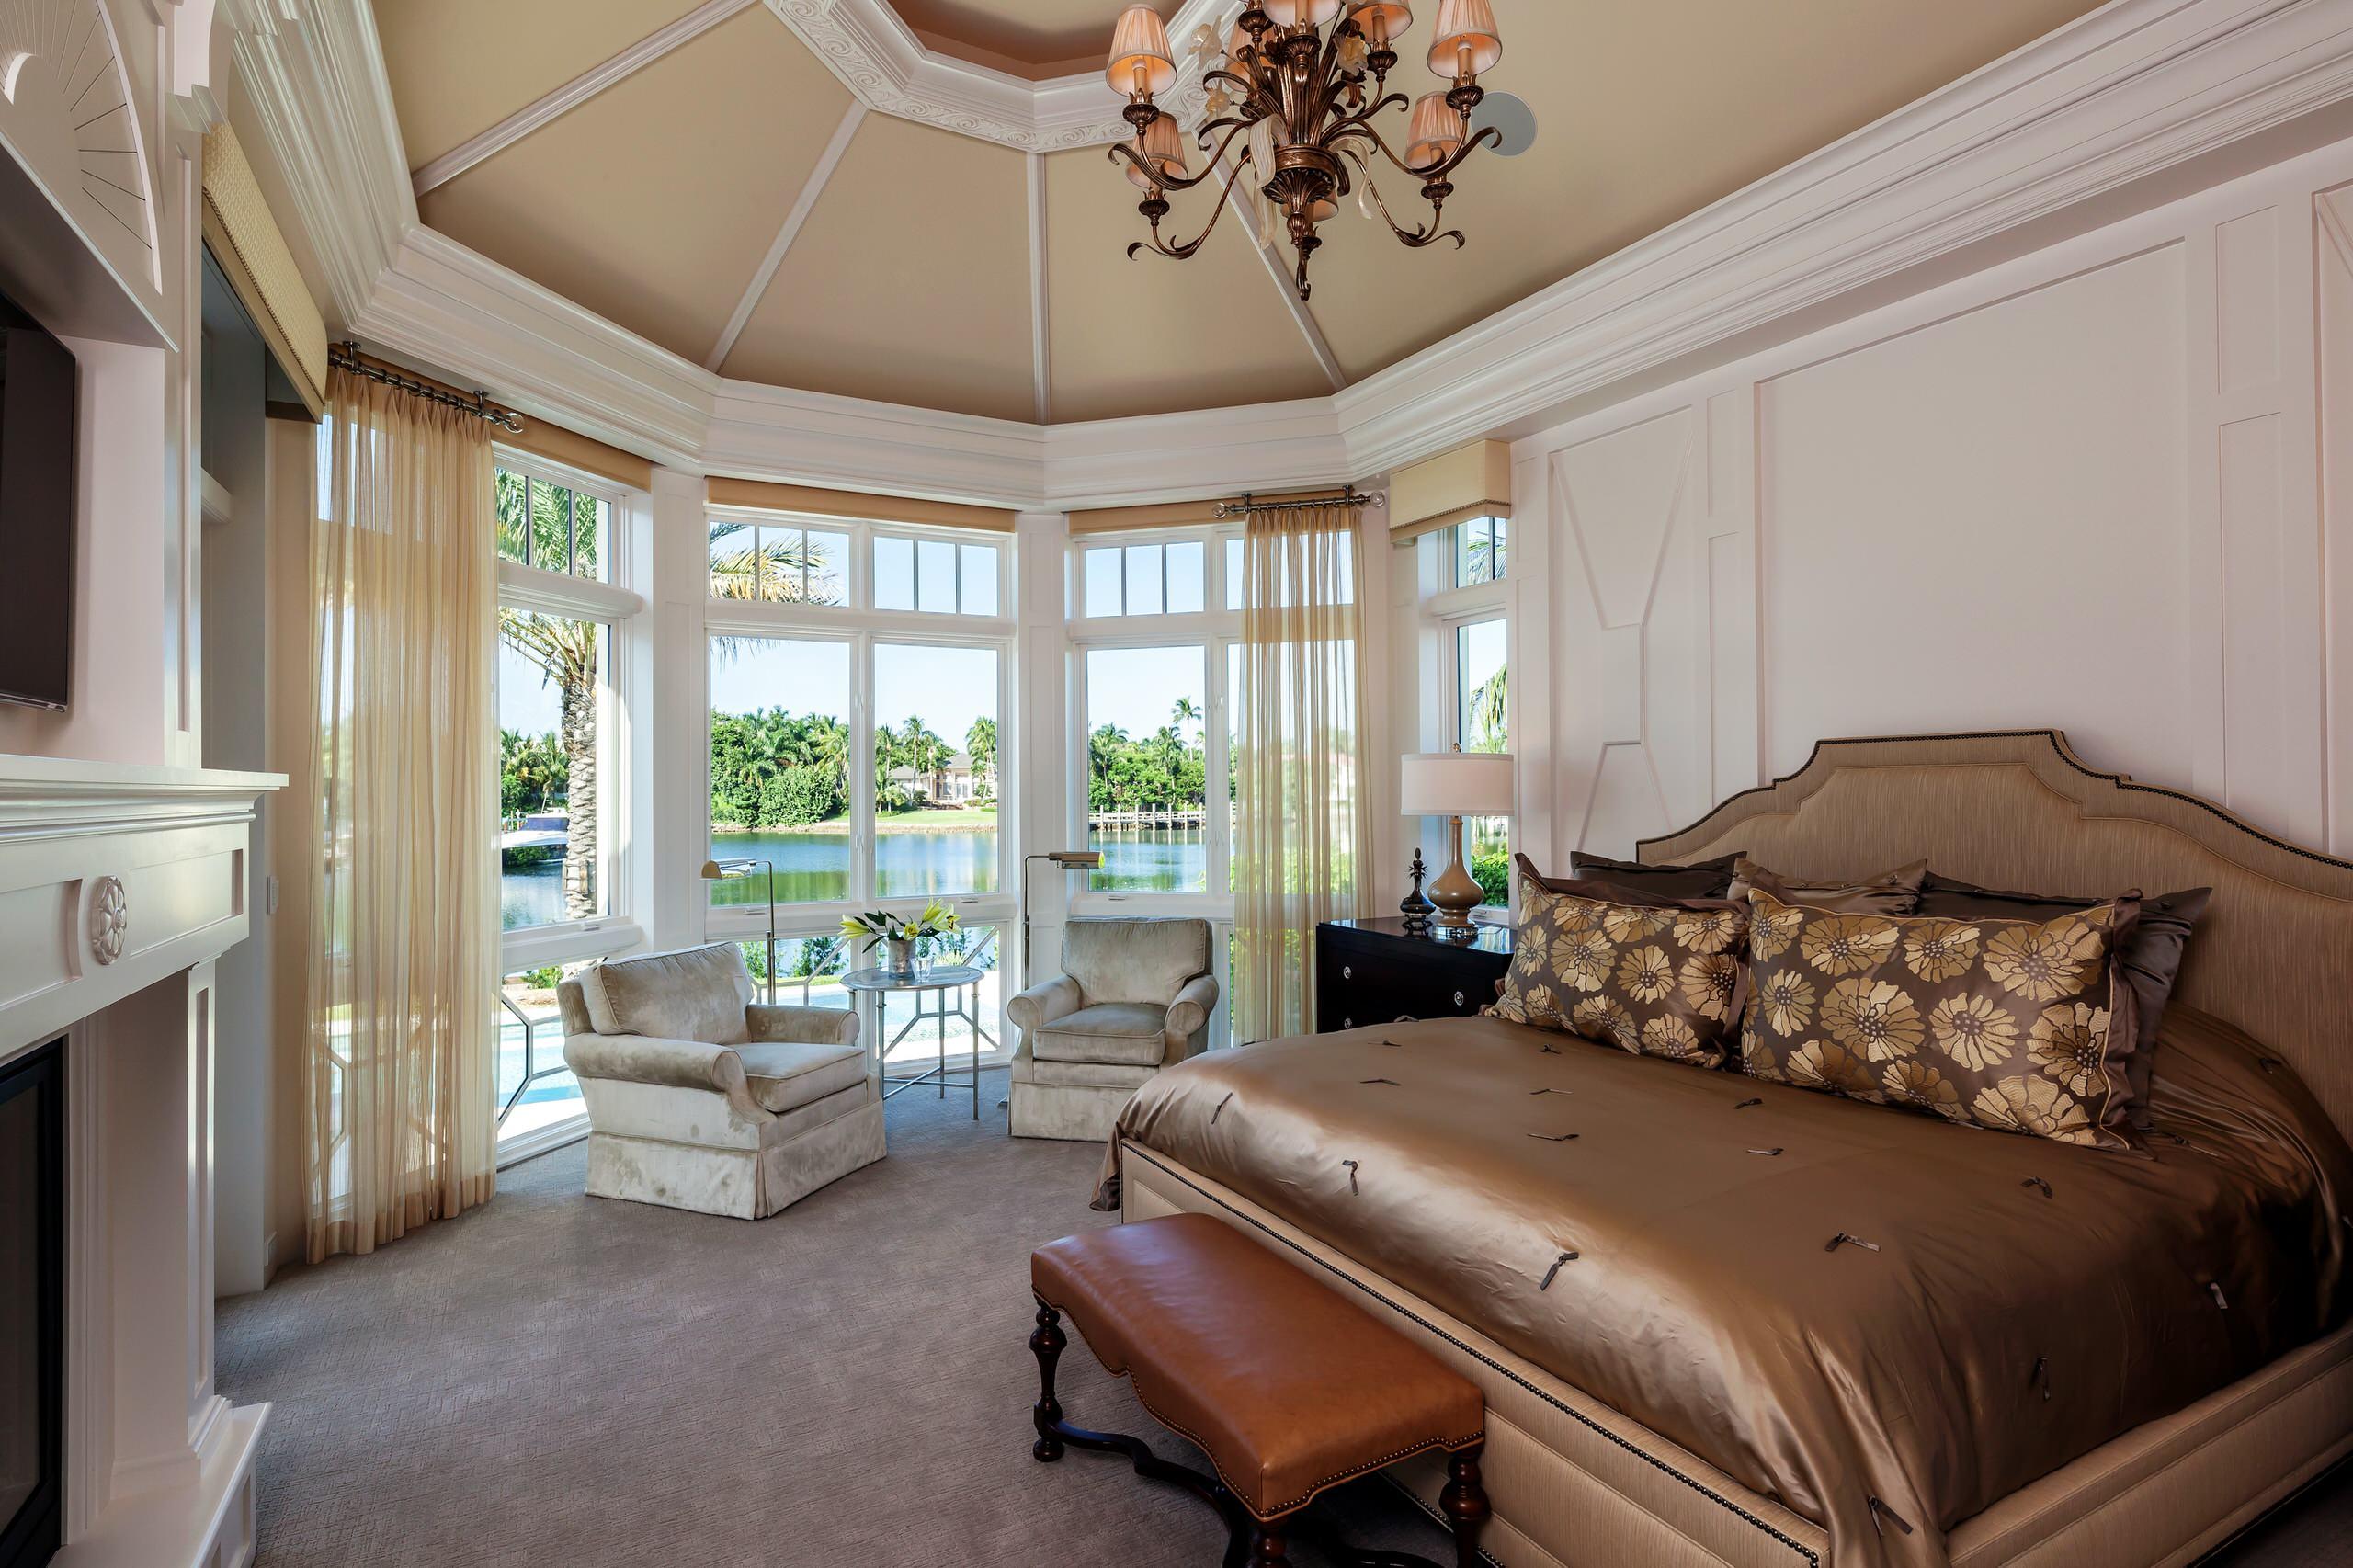 Royal Bedroom Houzz